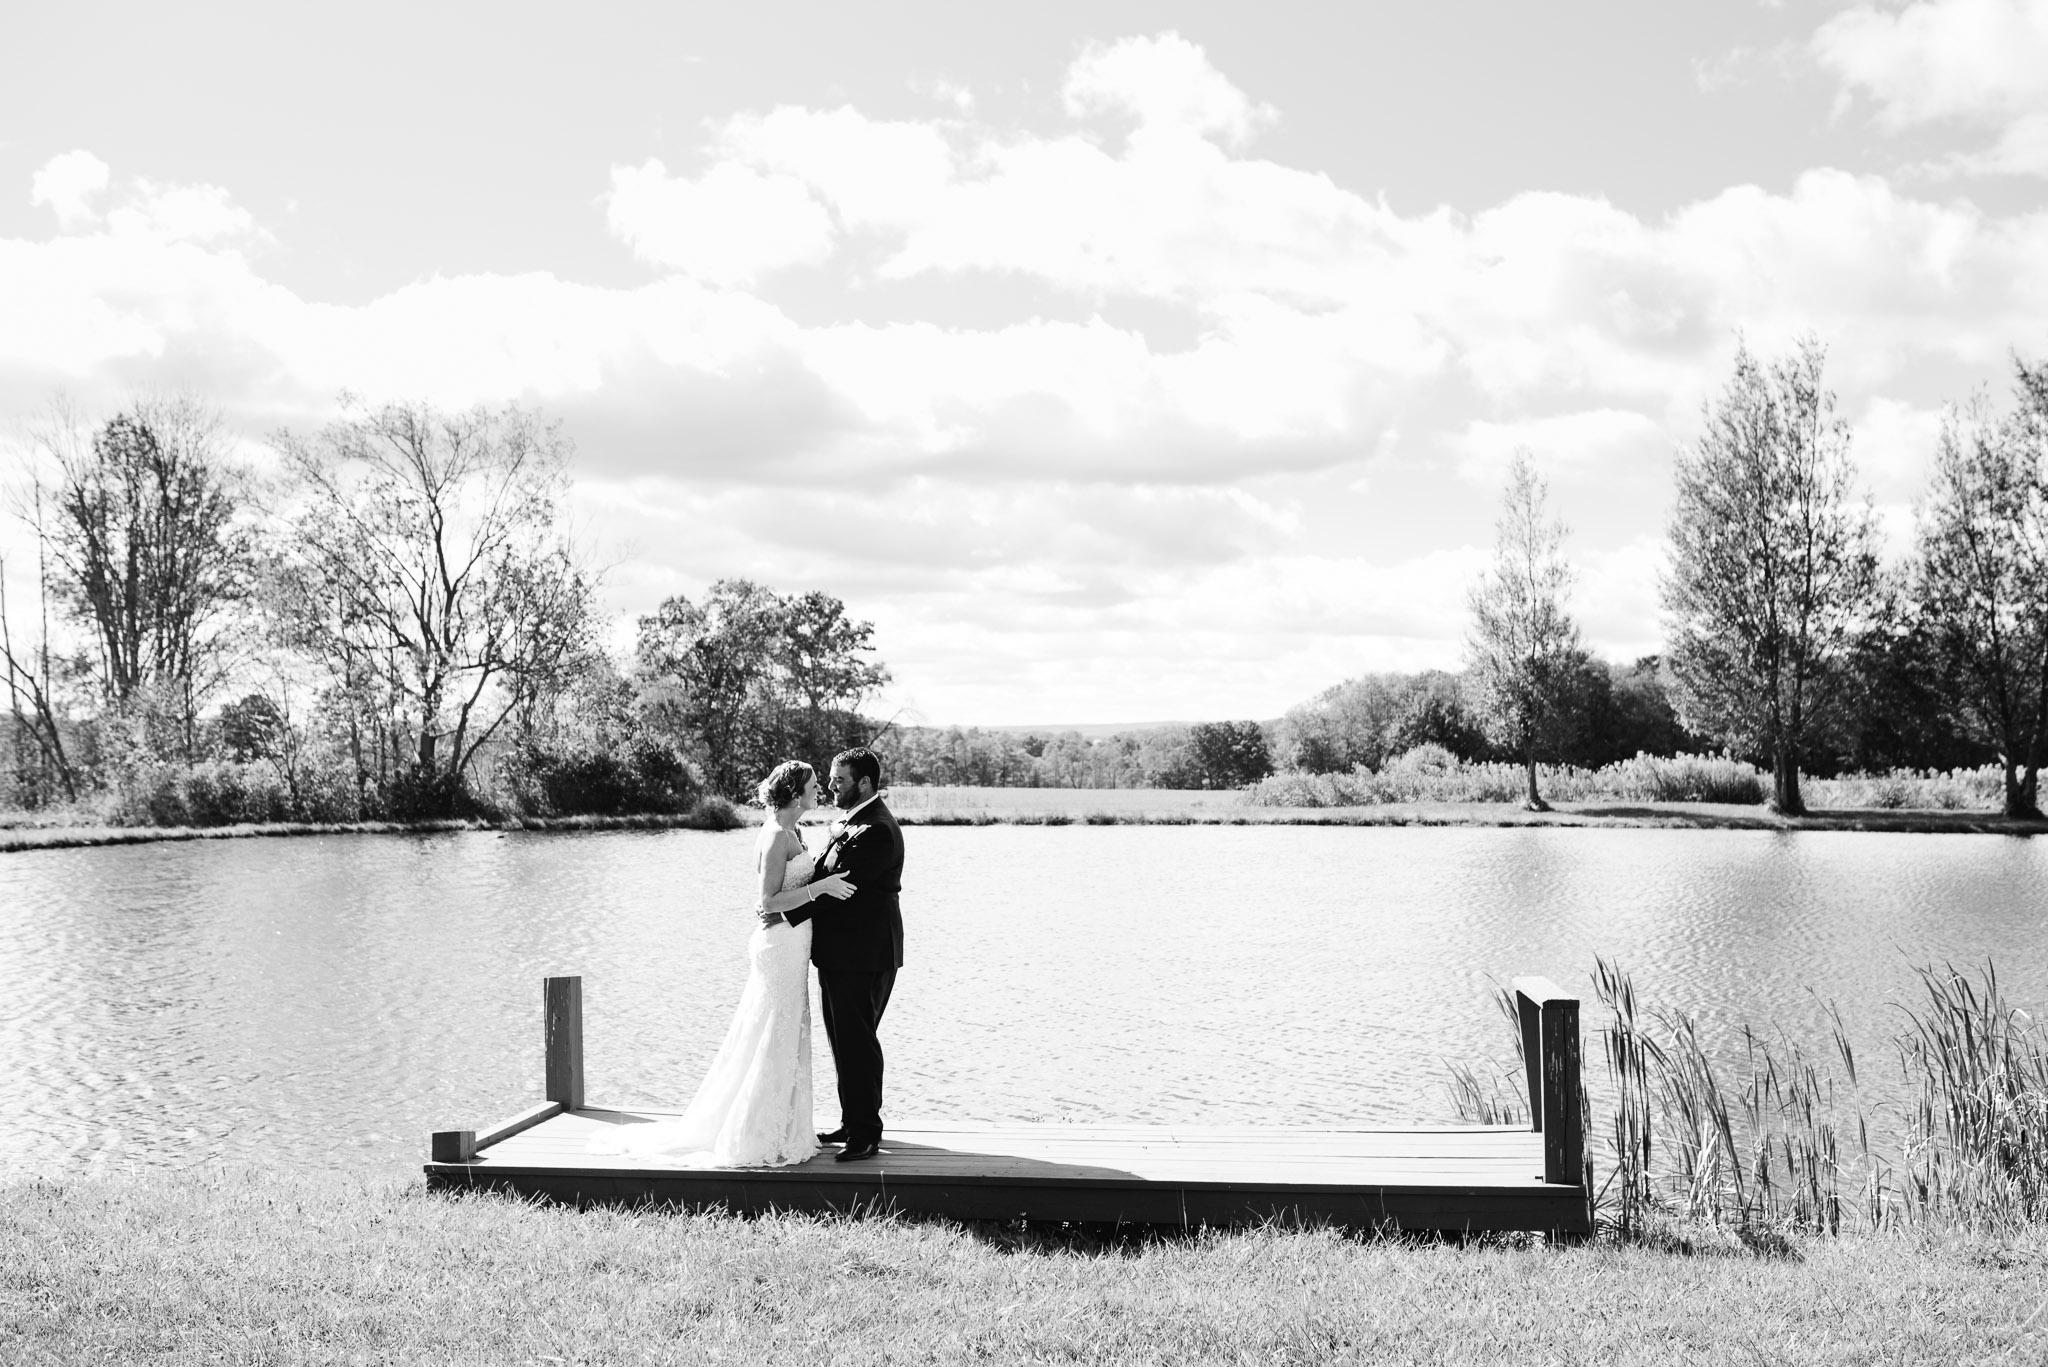 pittsburgh-ligonier-wedding-photographer-the-event-barn-at-highland-farms-1.jpg